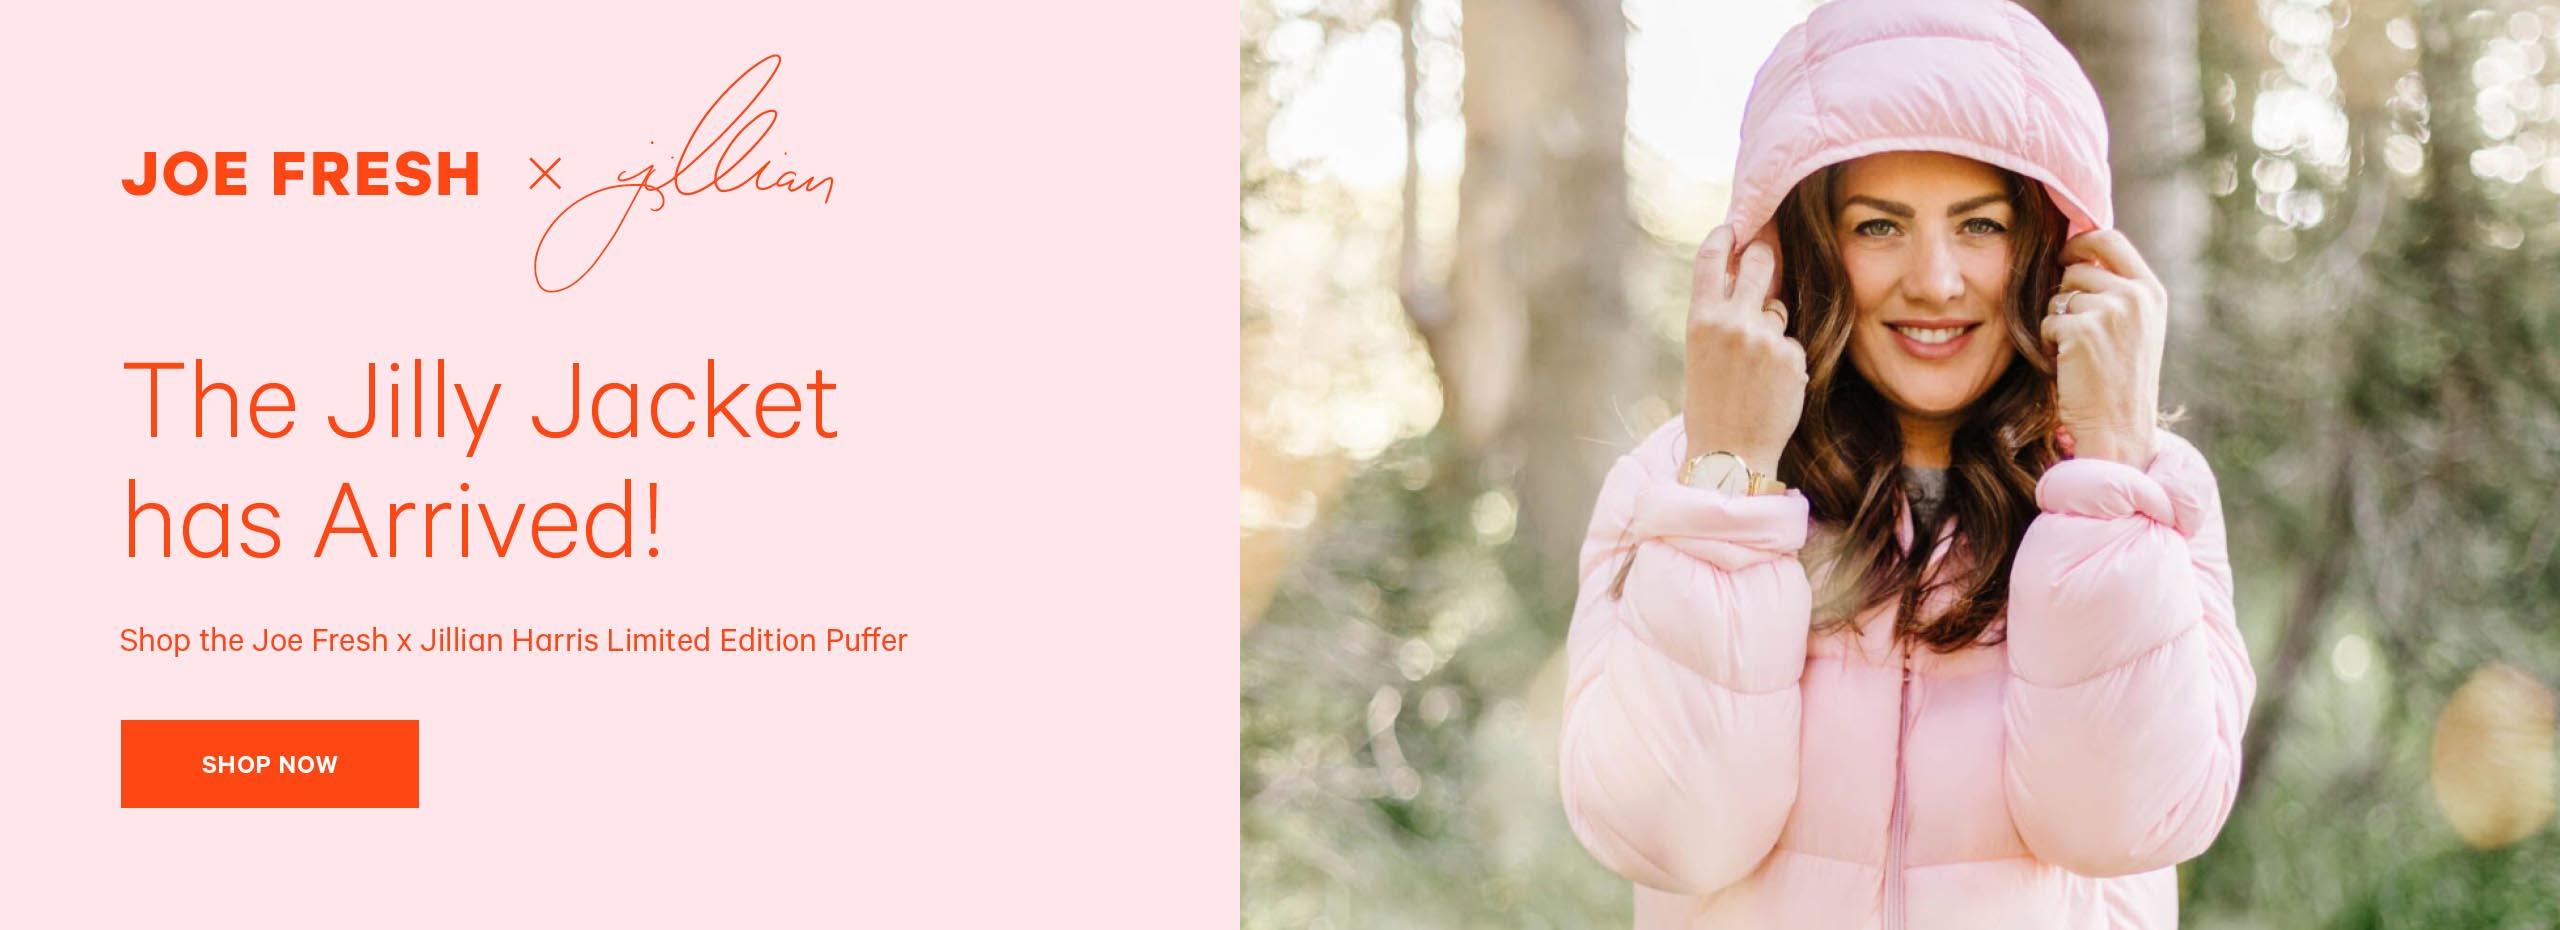 Shop the  Jillian Harris  and Joe Fresh Limited Edition Puffer